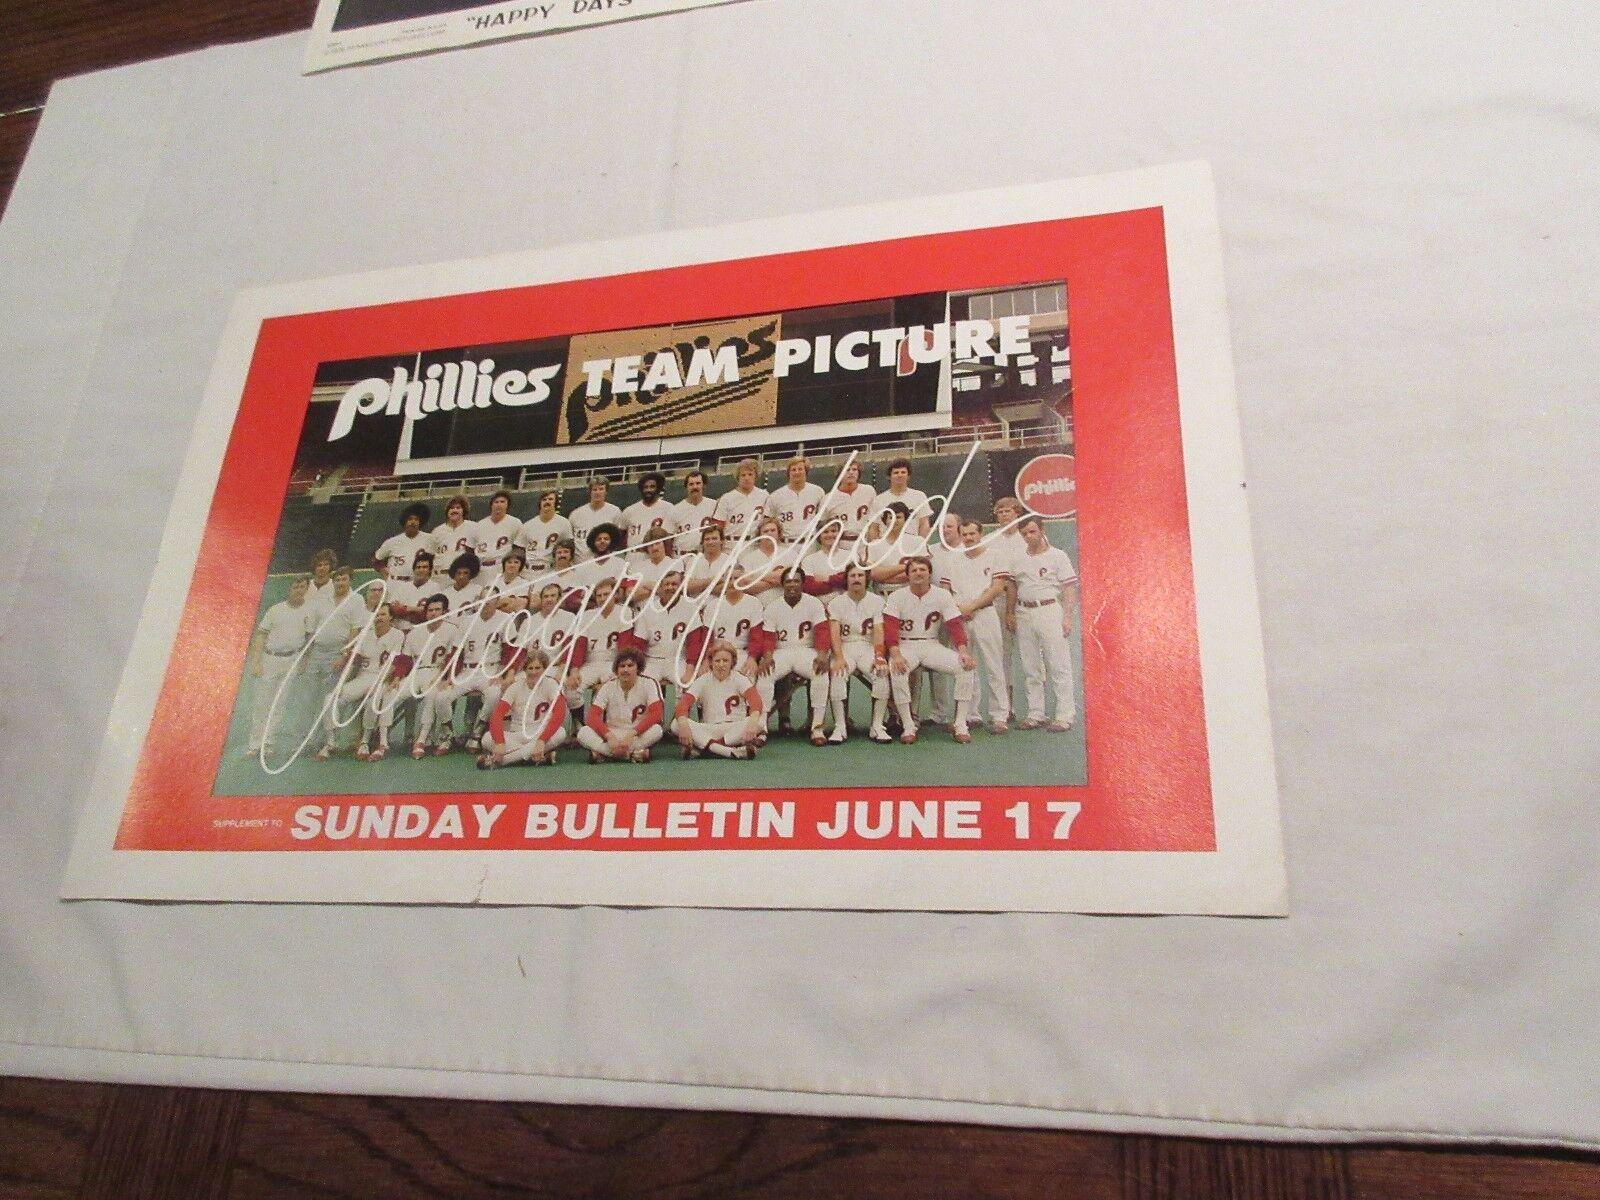 Philadelphia Phillies , Team Picture Poster ,Sunday Bul